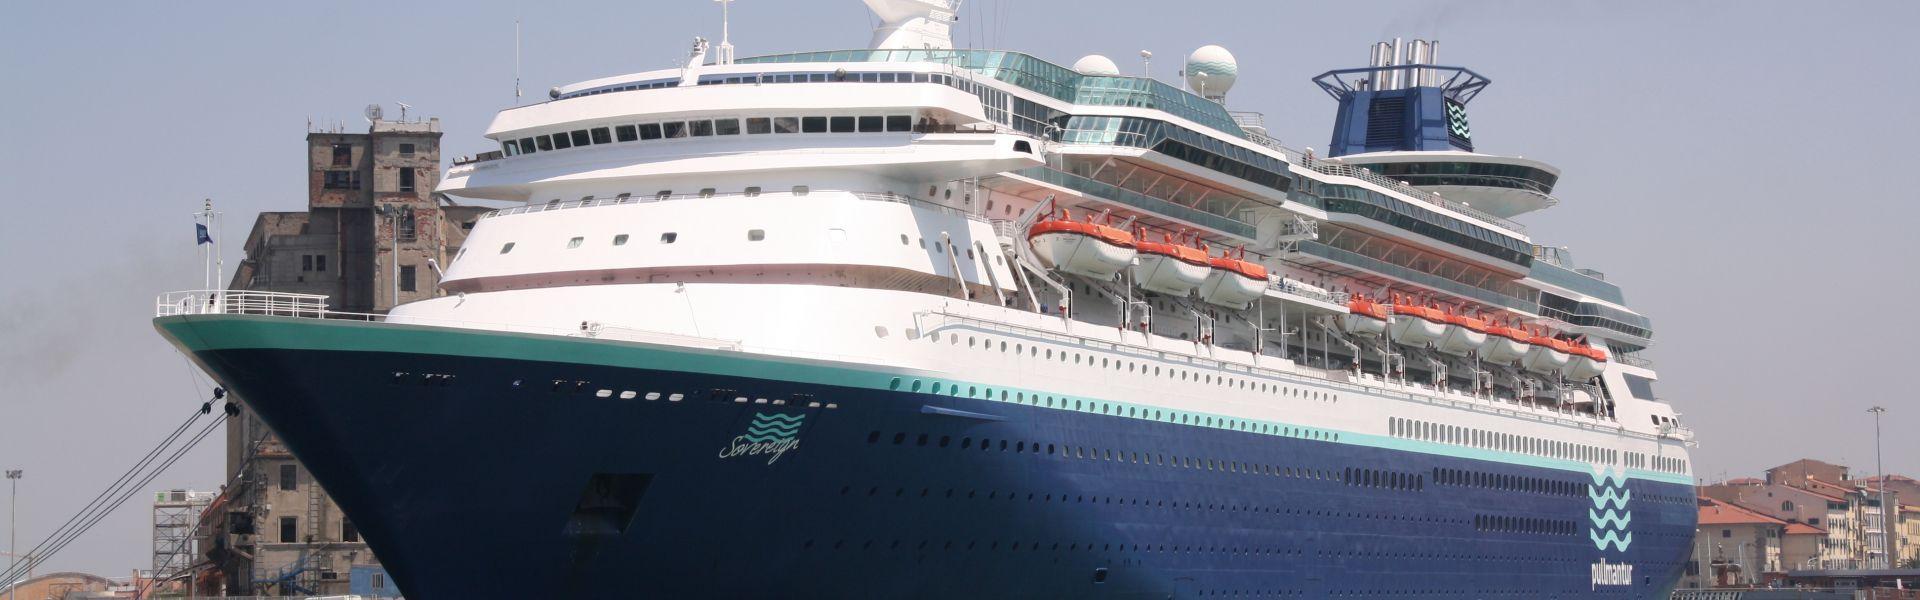 Croaziera 2017 - Mediterana de Vest (Barcelona) - Pullmantur Cruises - Sovereign  - 7 nopti